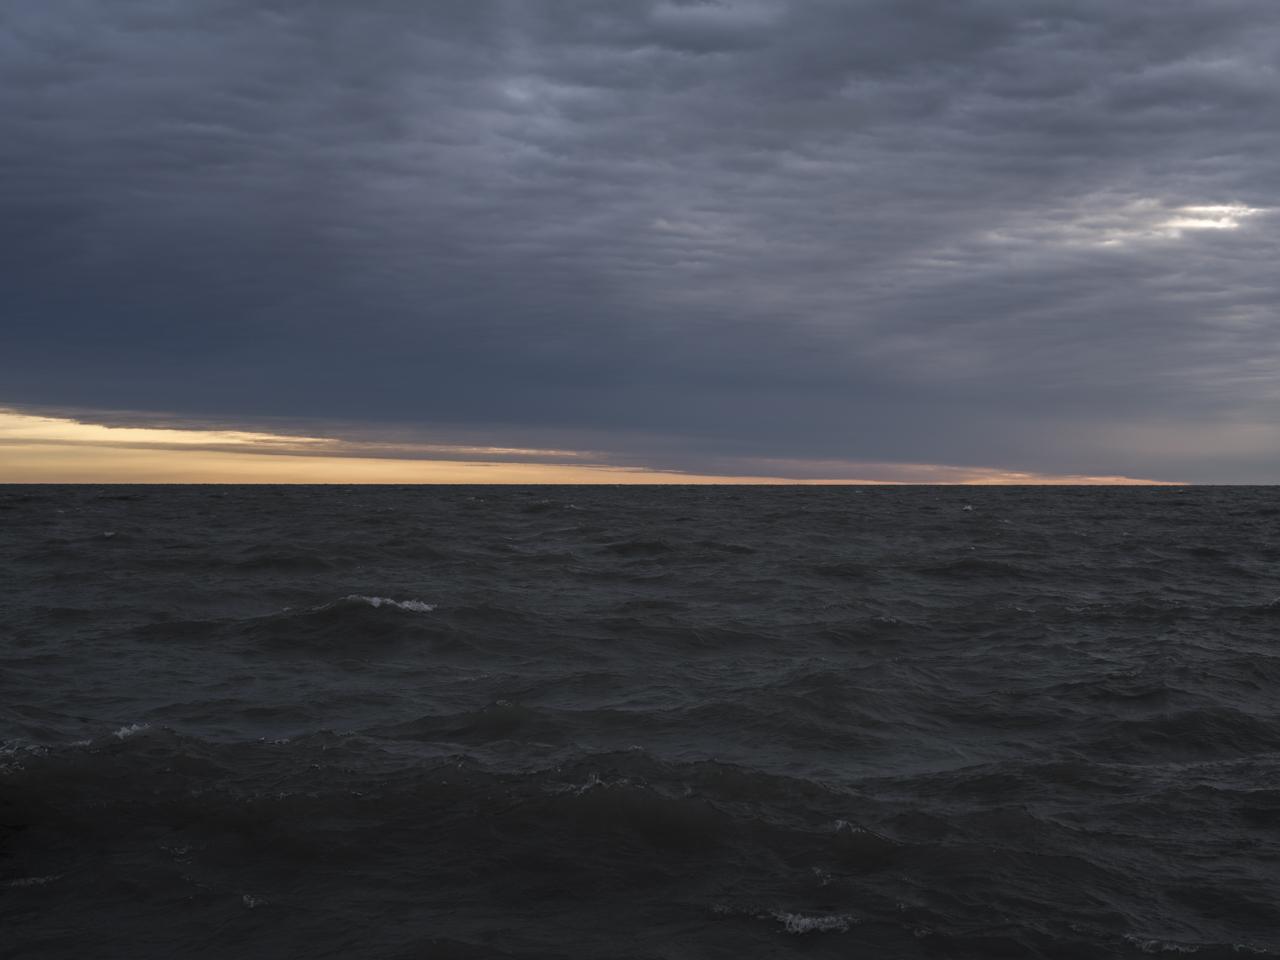 dark skies and water over Lake Michigan and a golden yellow horizon